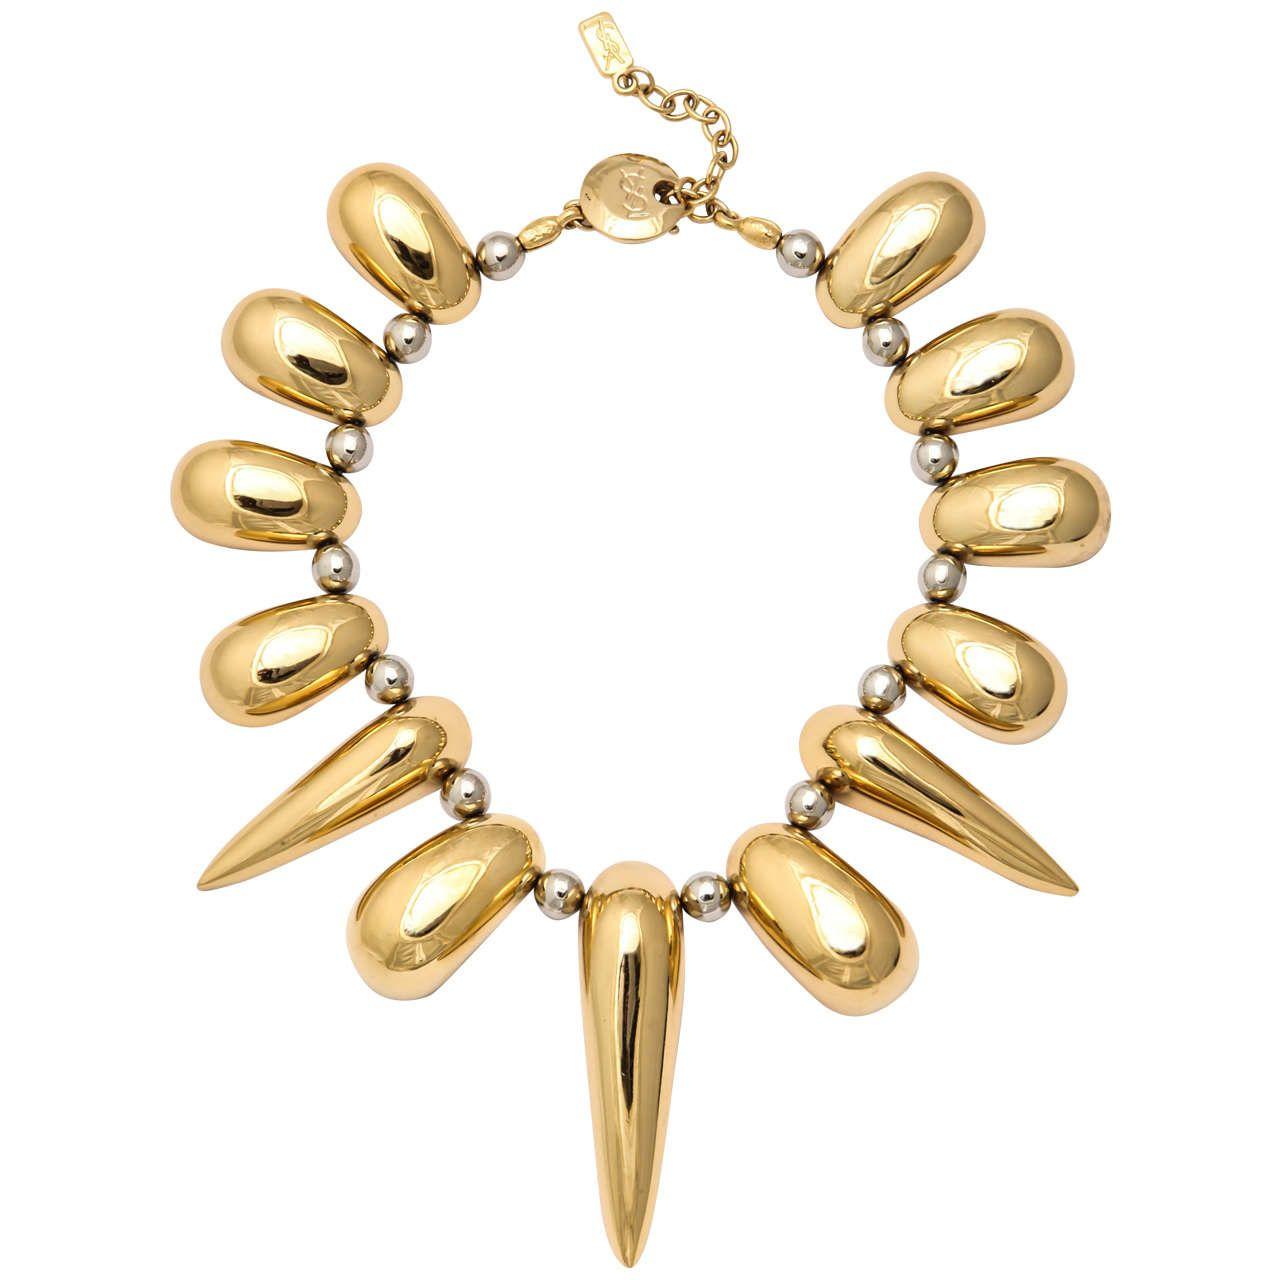 Ysl vintage necklace or collier ysl vintage and gold